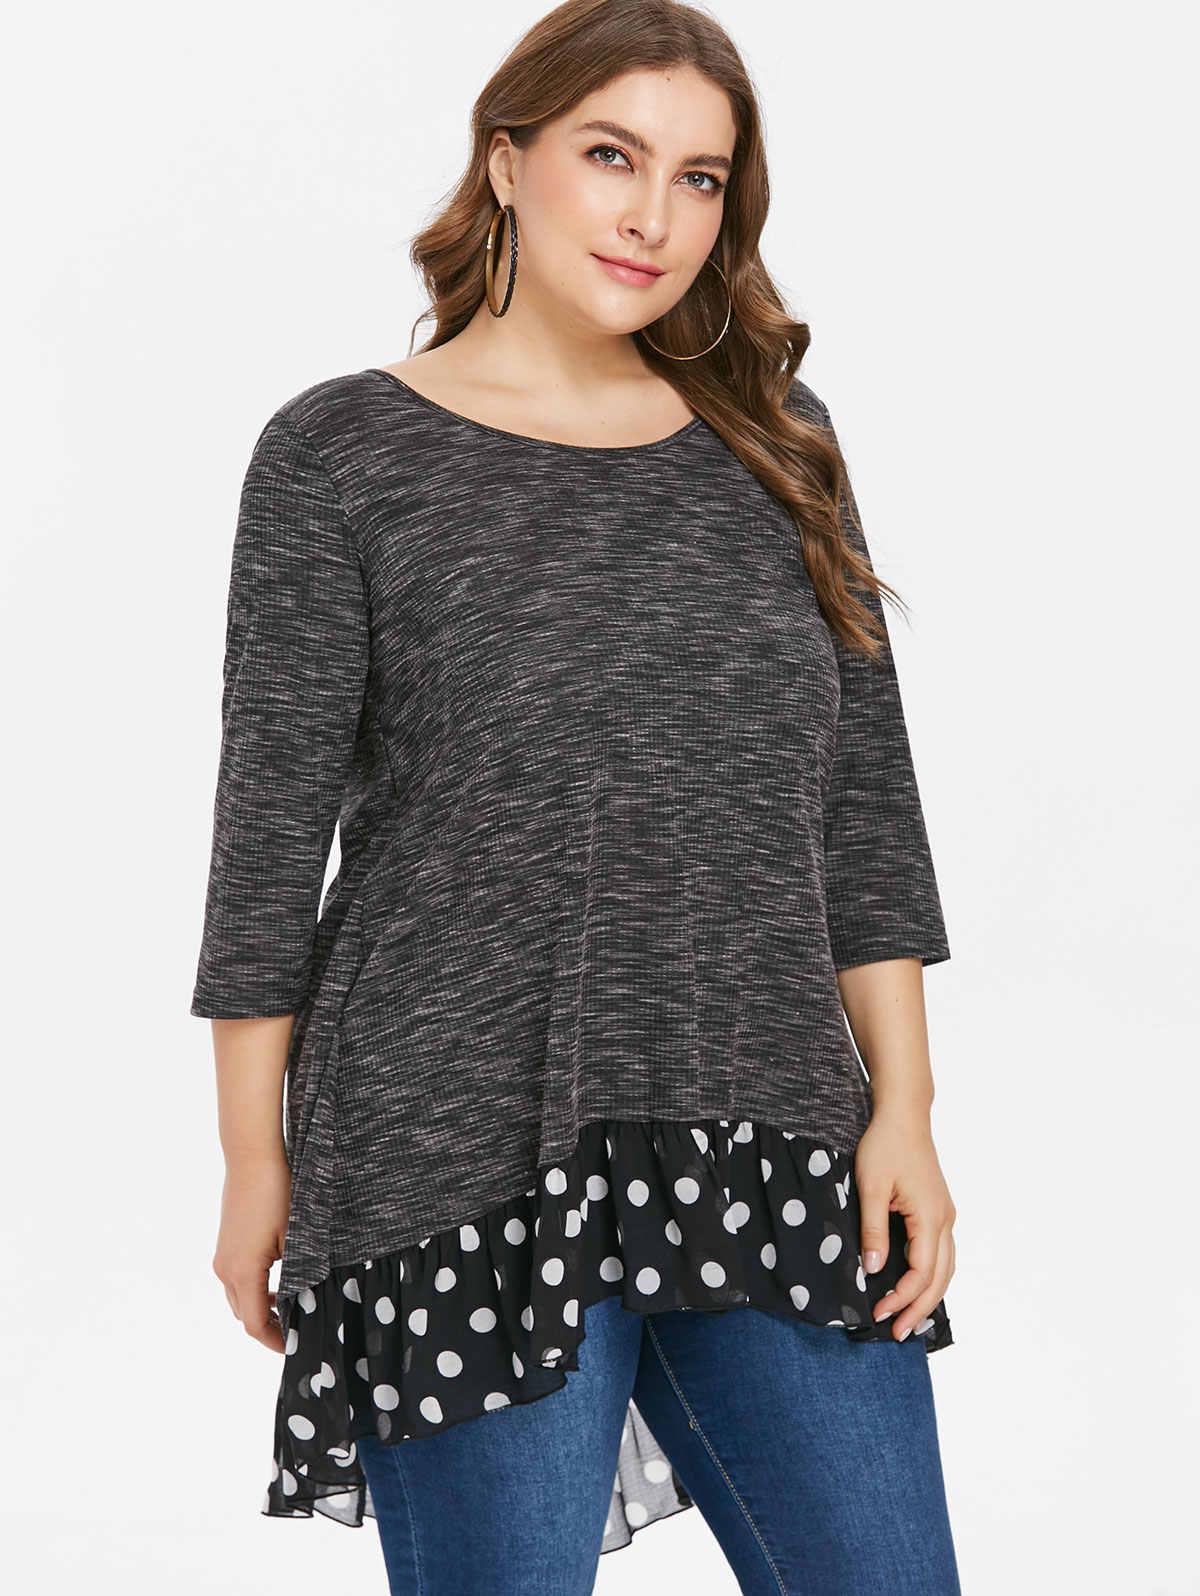 09c751a1a8d ... Wipalo Plus Size 5XL Polka Dot Three Quarter Sleeve T-Shirt Bow Embellished  Asymmetrical Hem ...